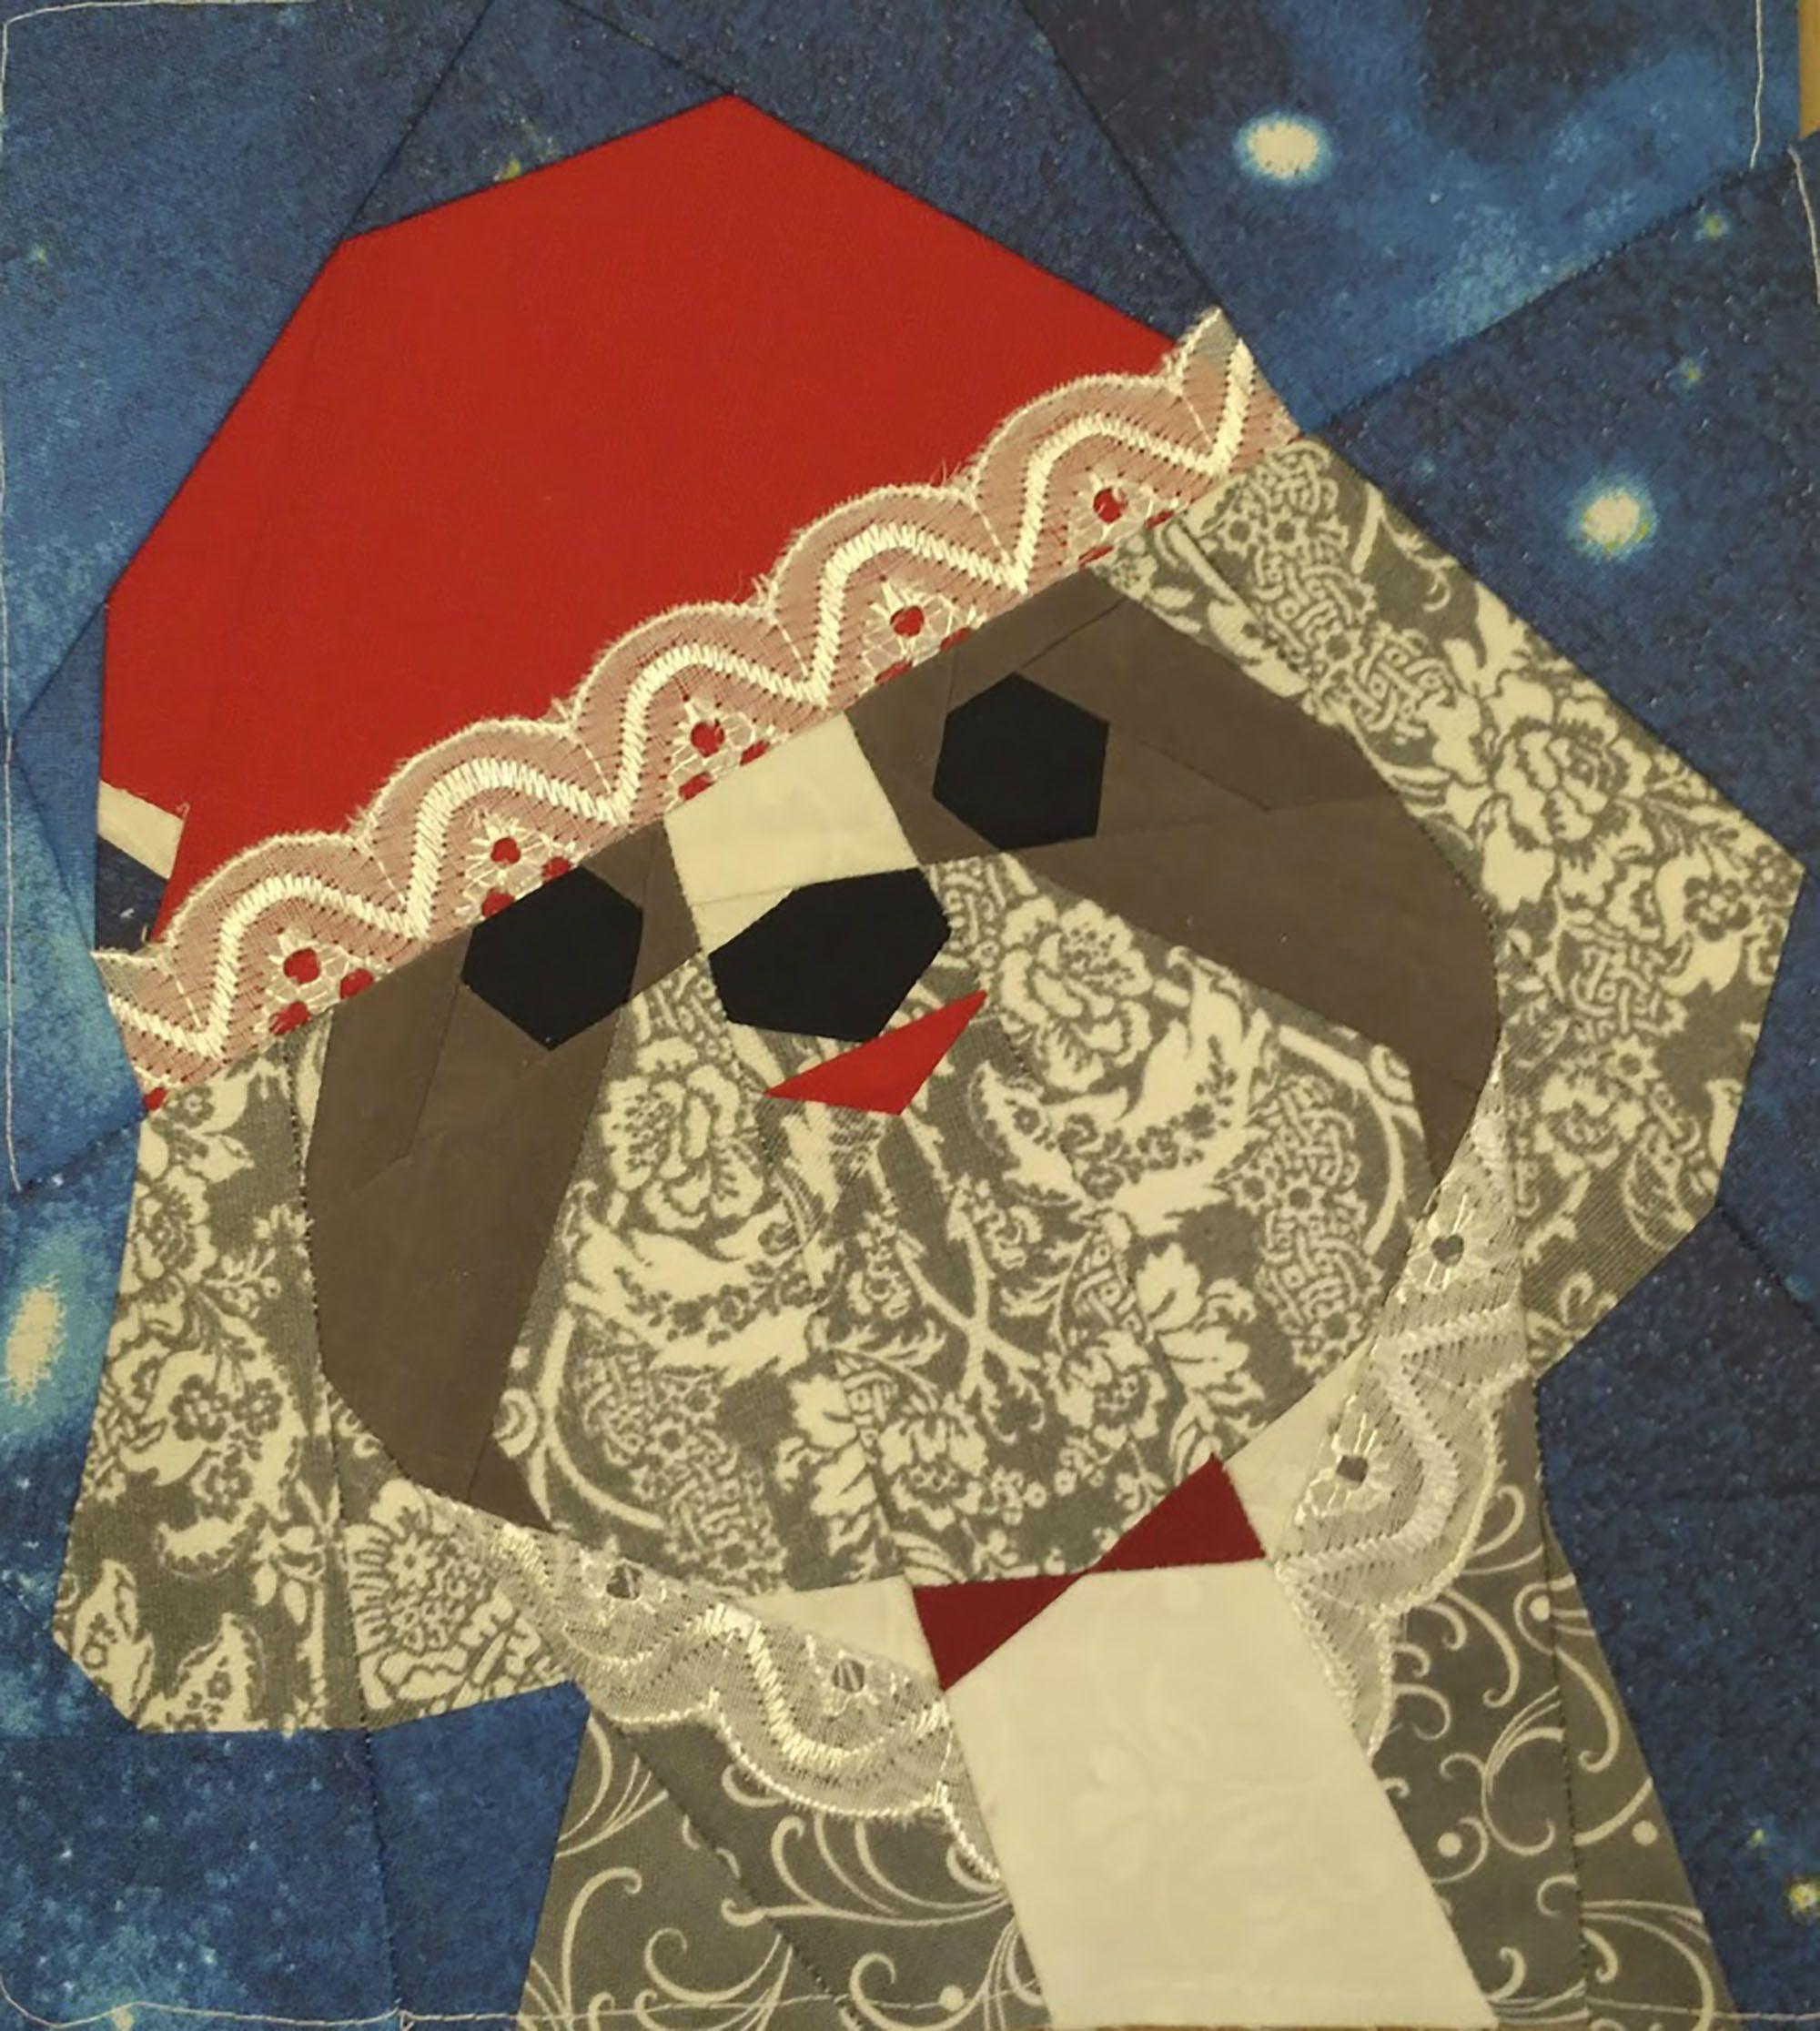 Shih Tzu Christmas quilt block pattern | Etsy | Christmas ...